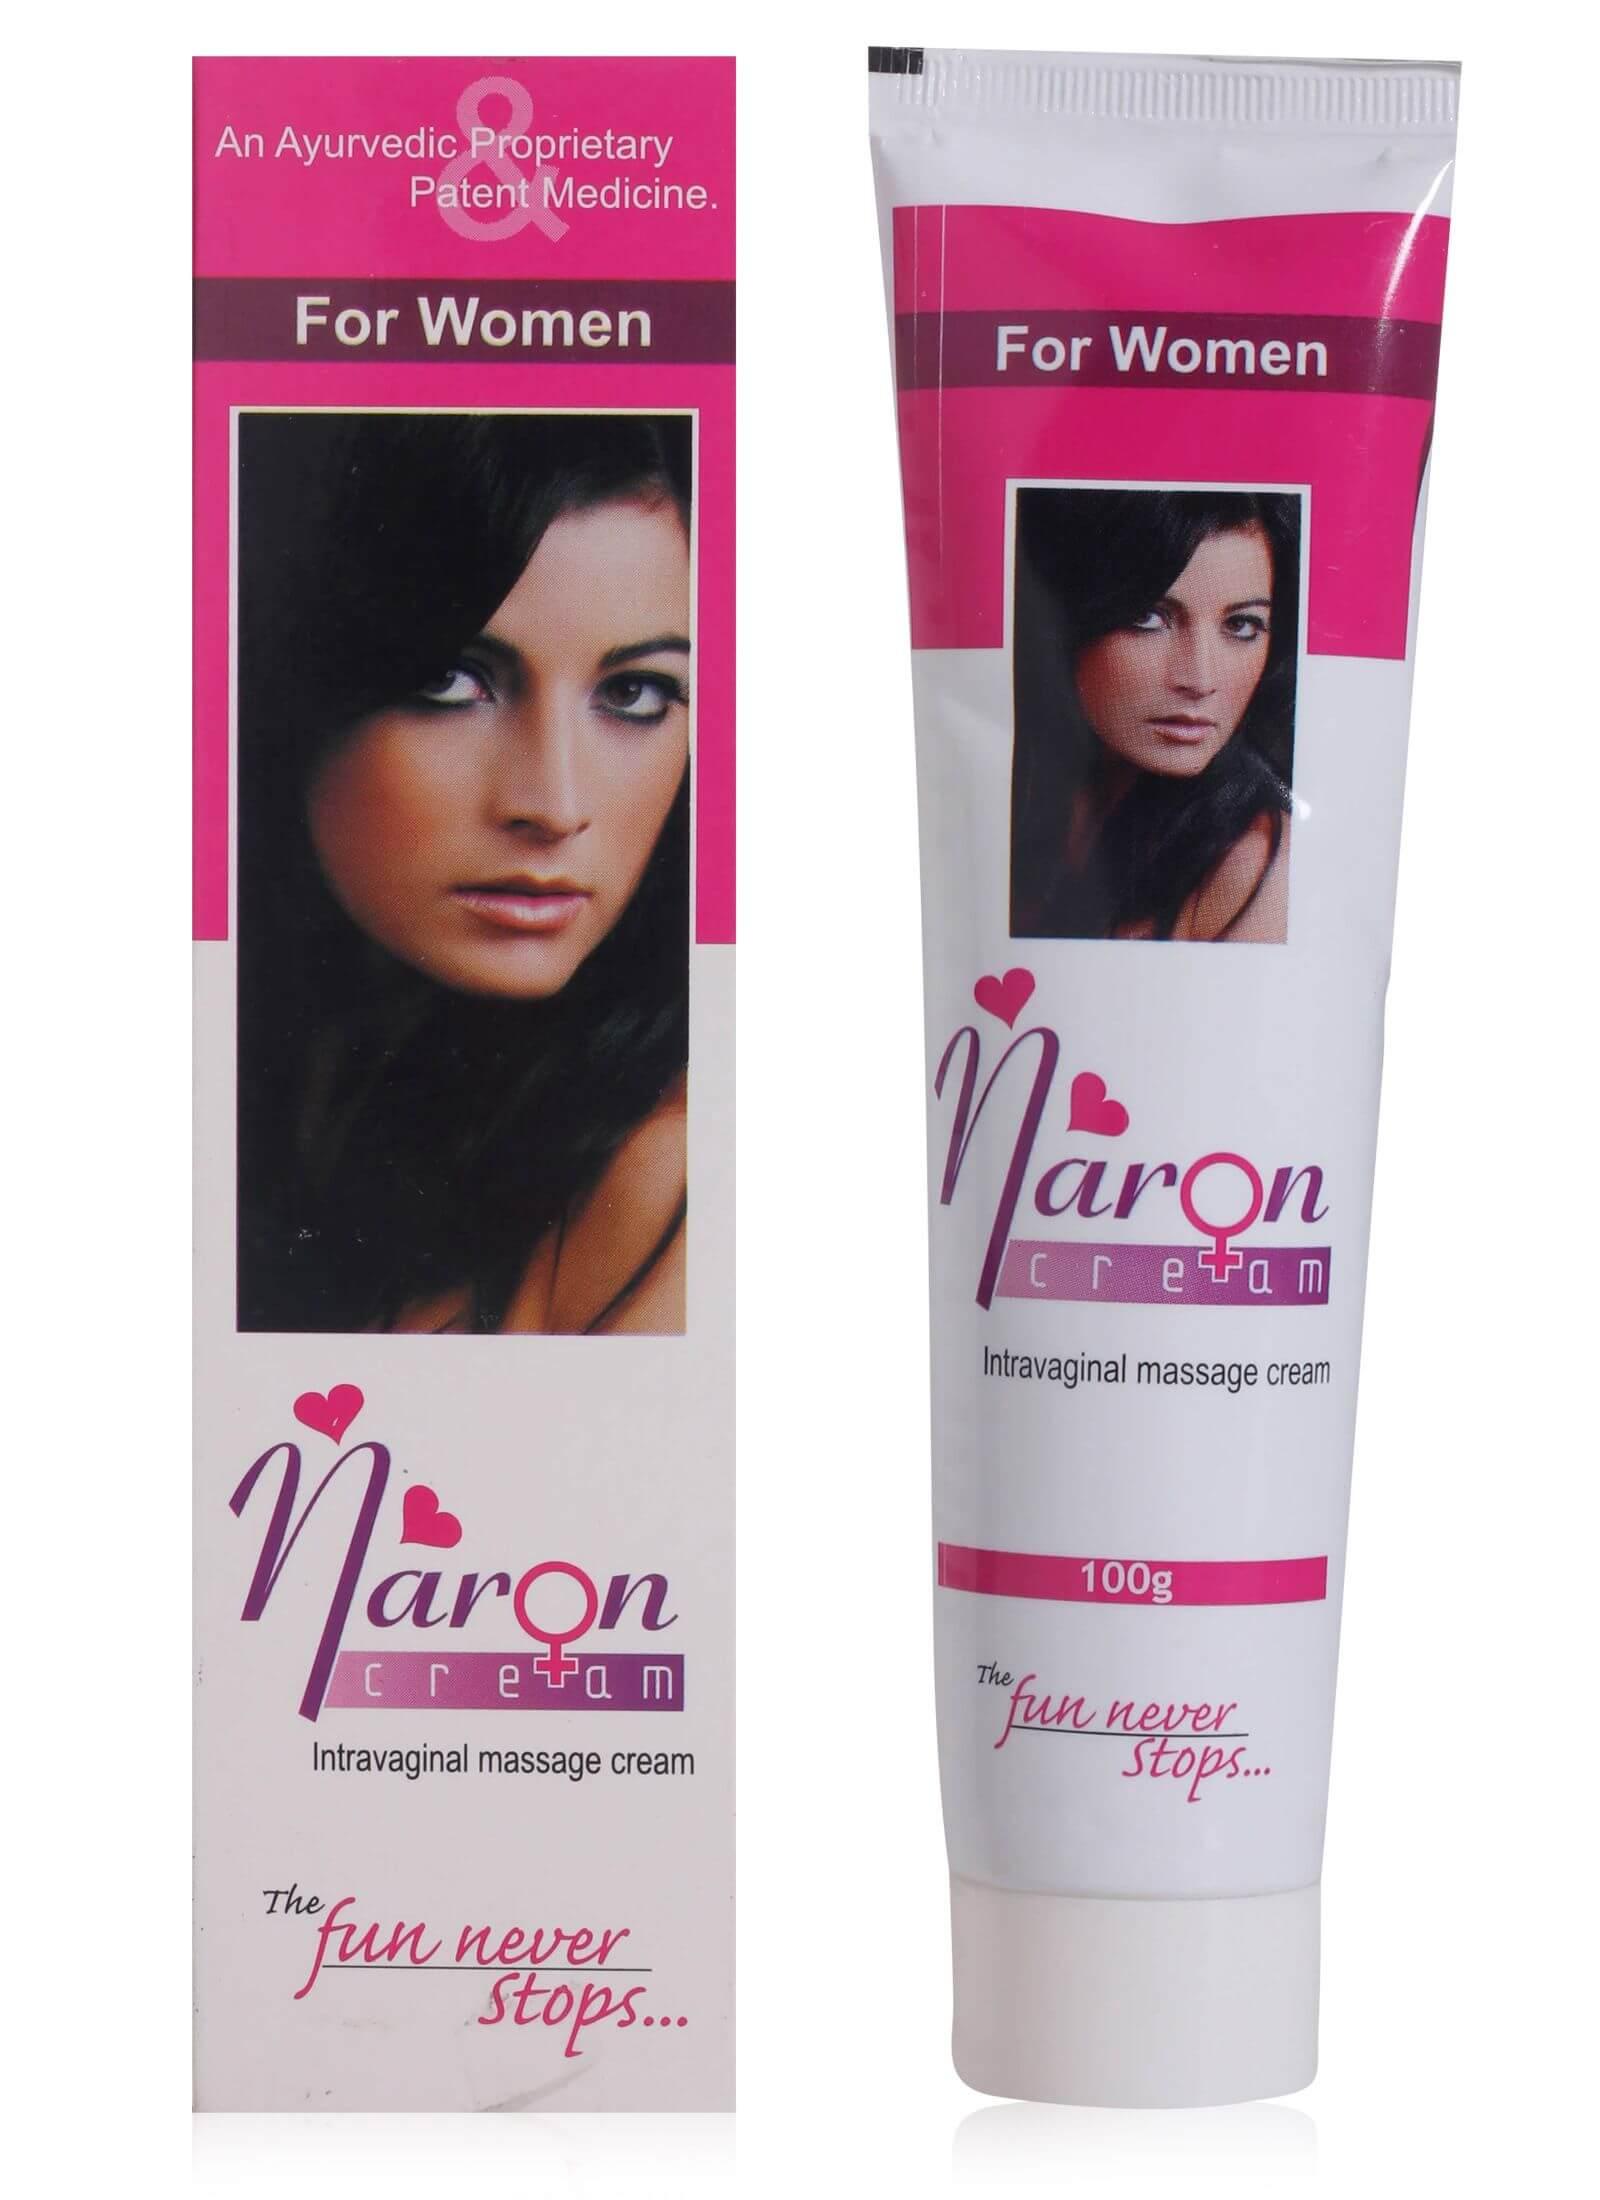 Viagra Cream For Women